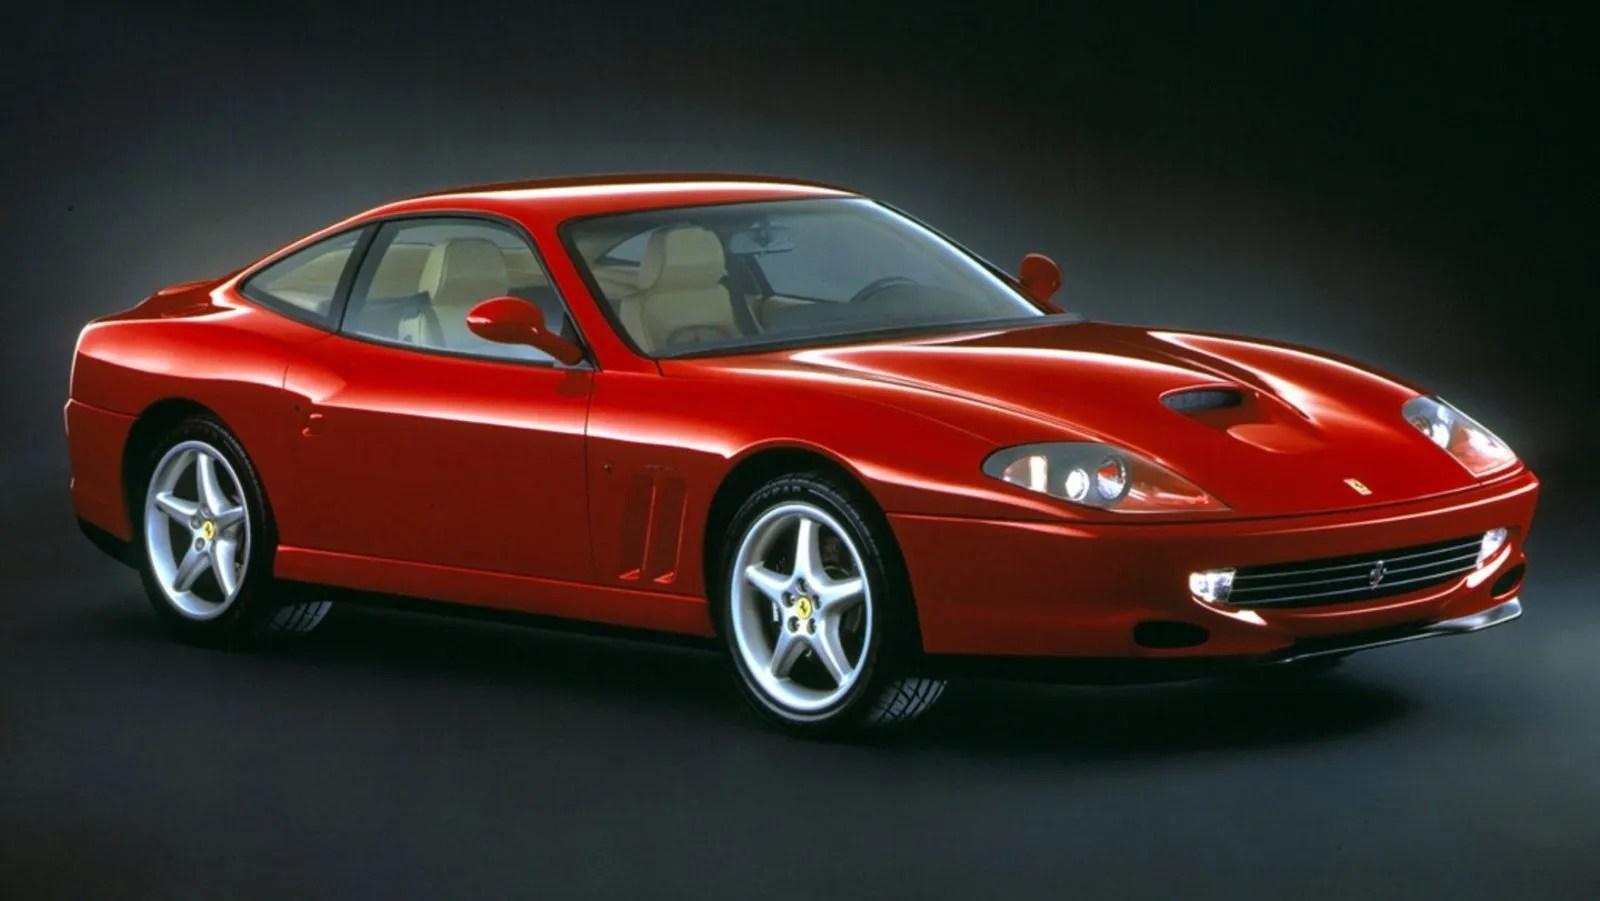 2001 Ferrari 550 Maranello Review